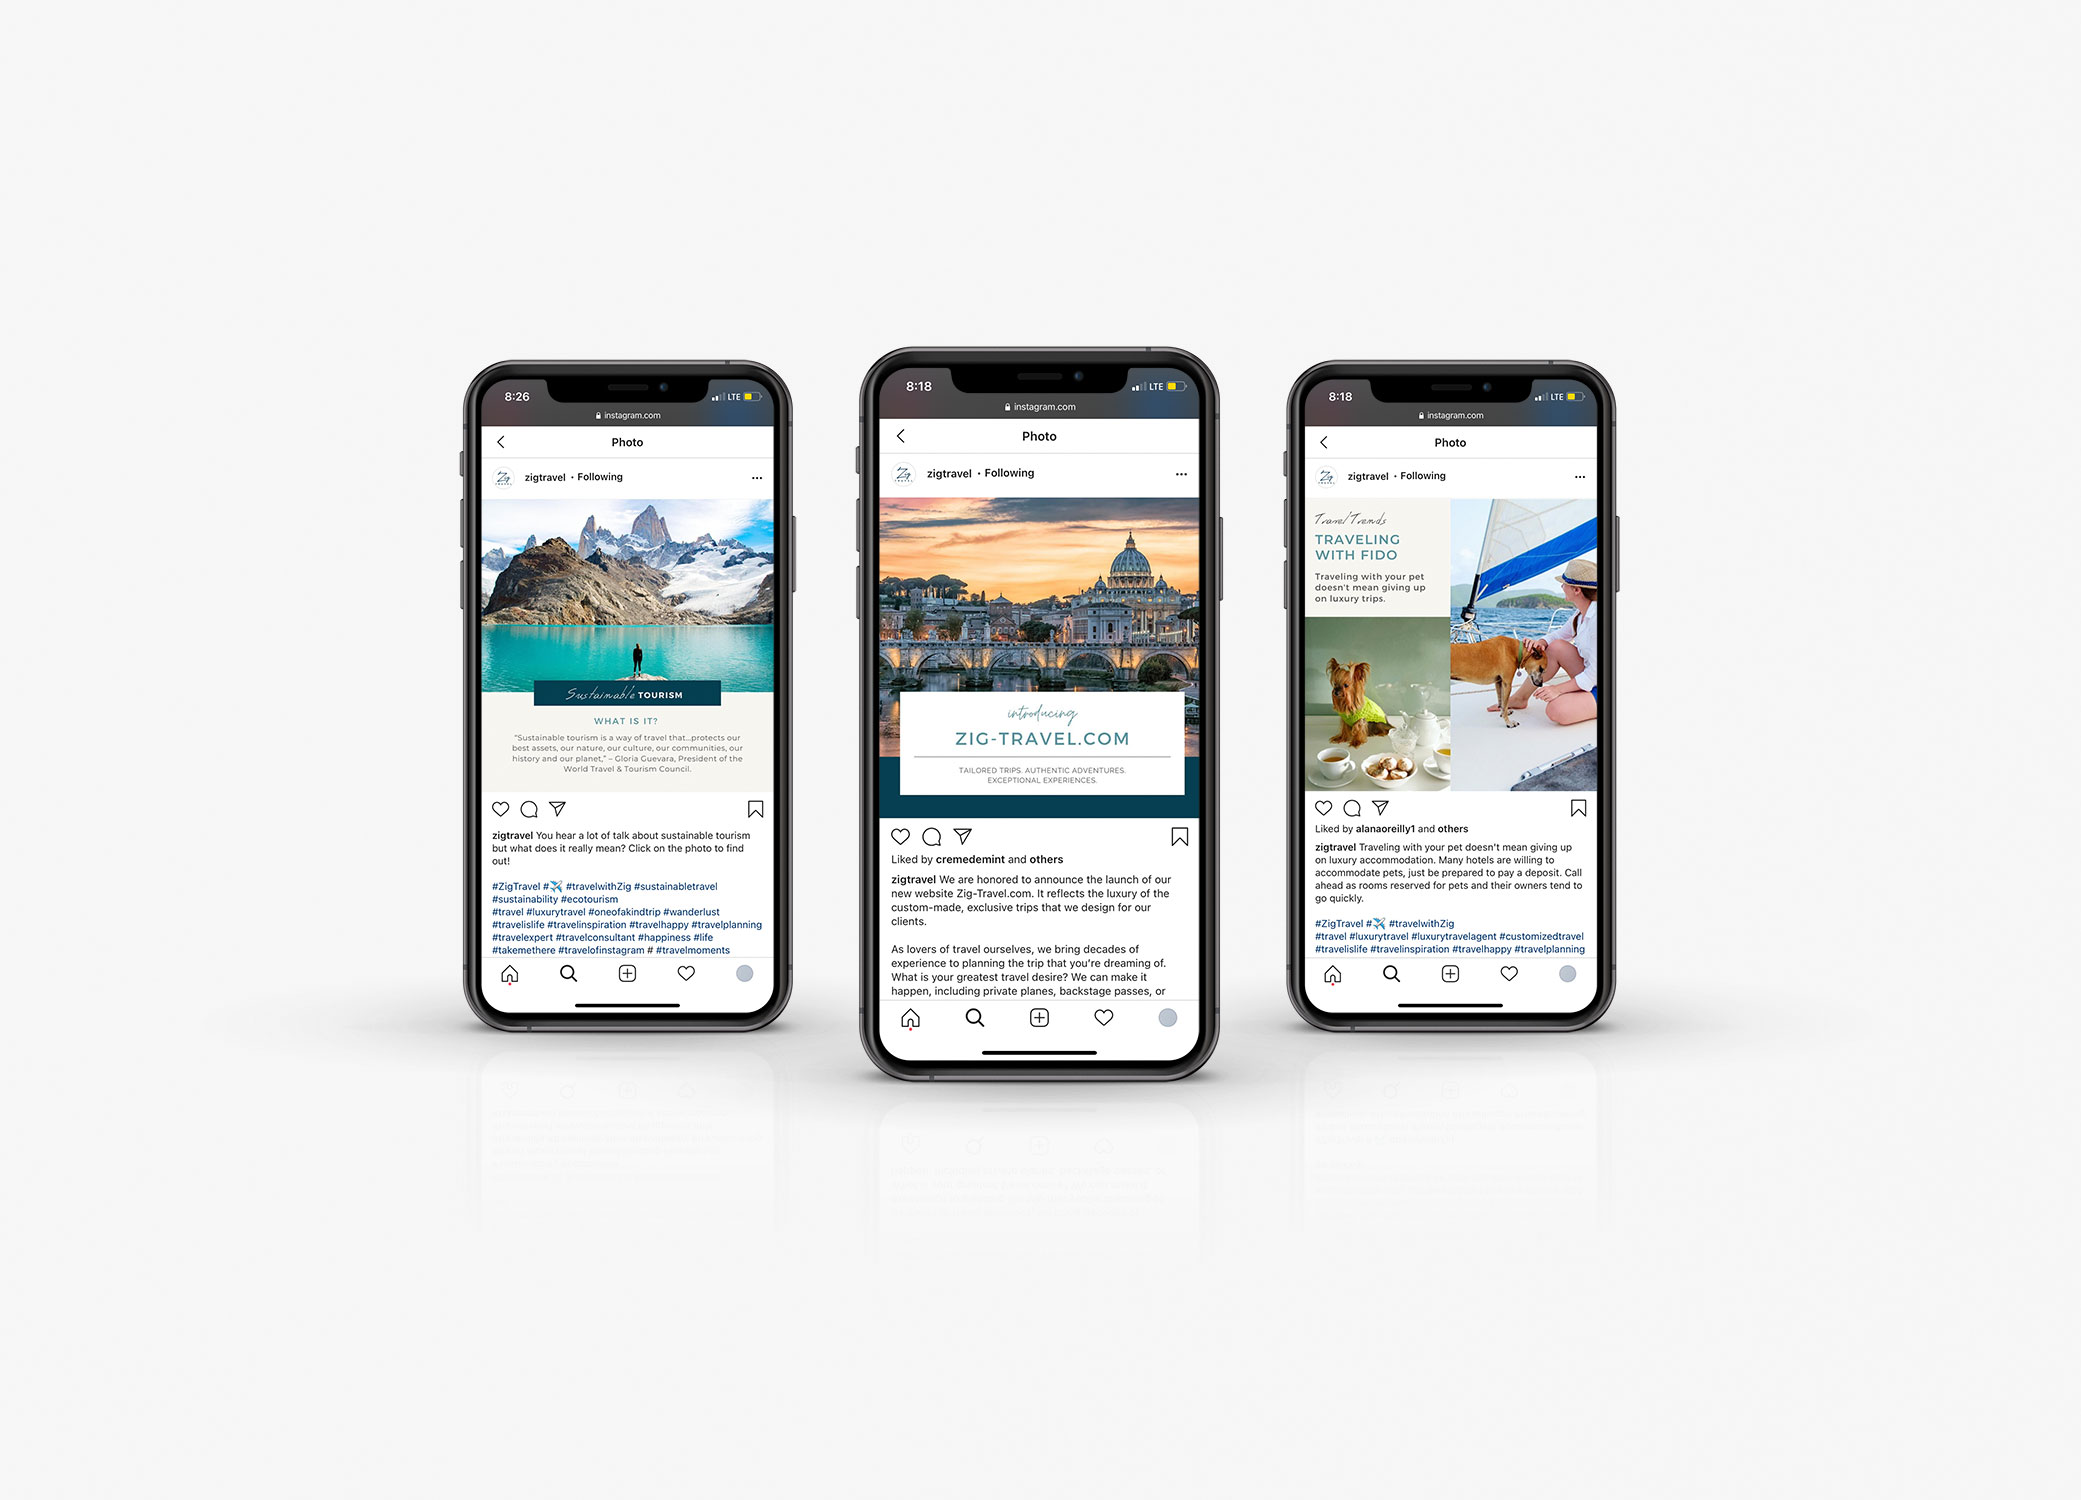 Zig Travel social media branding images in iPhone mockup.